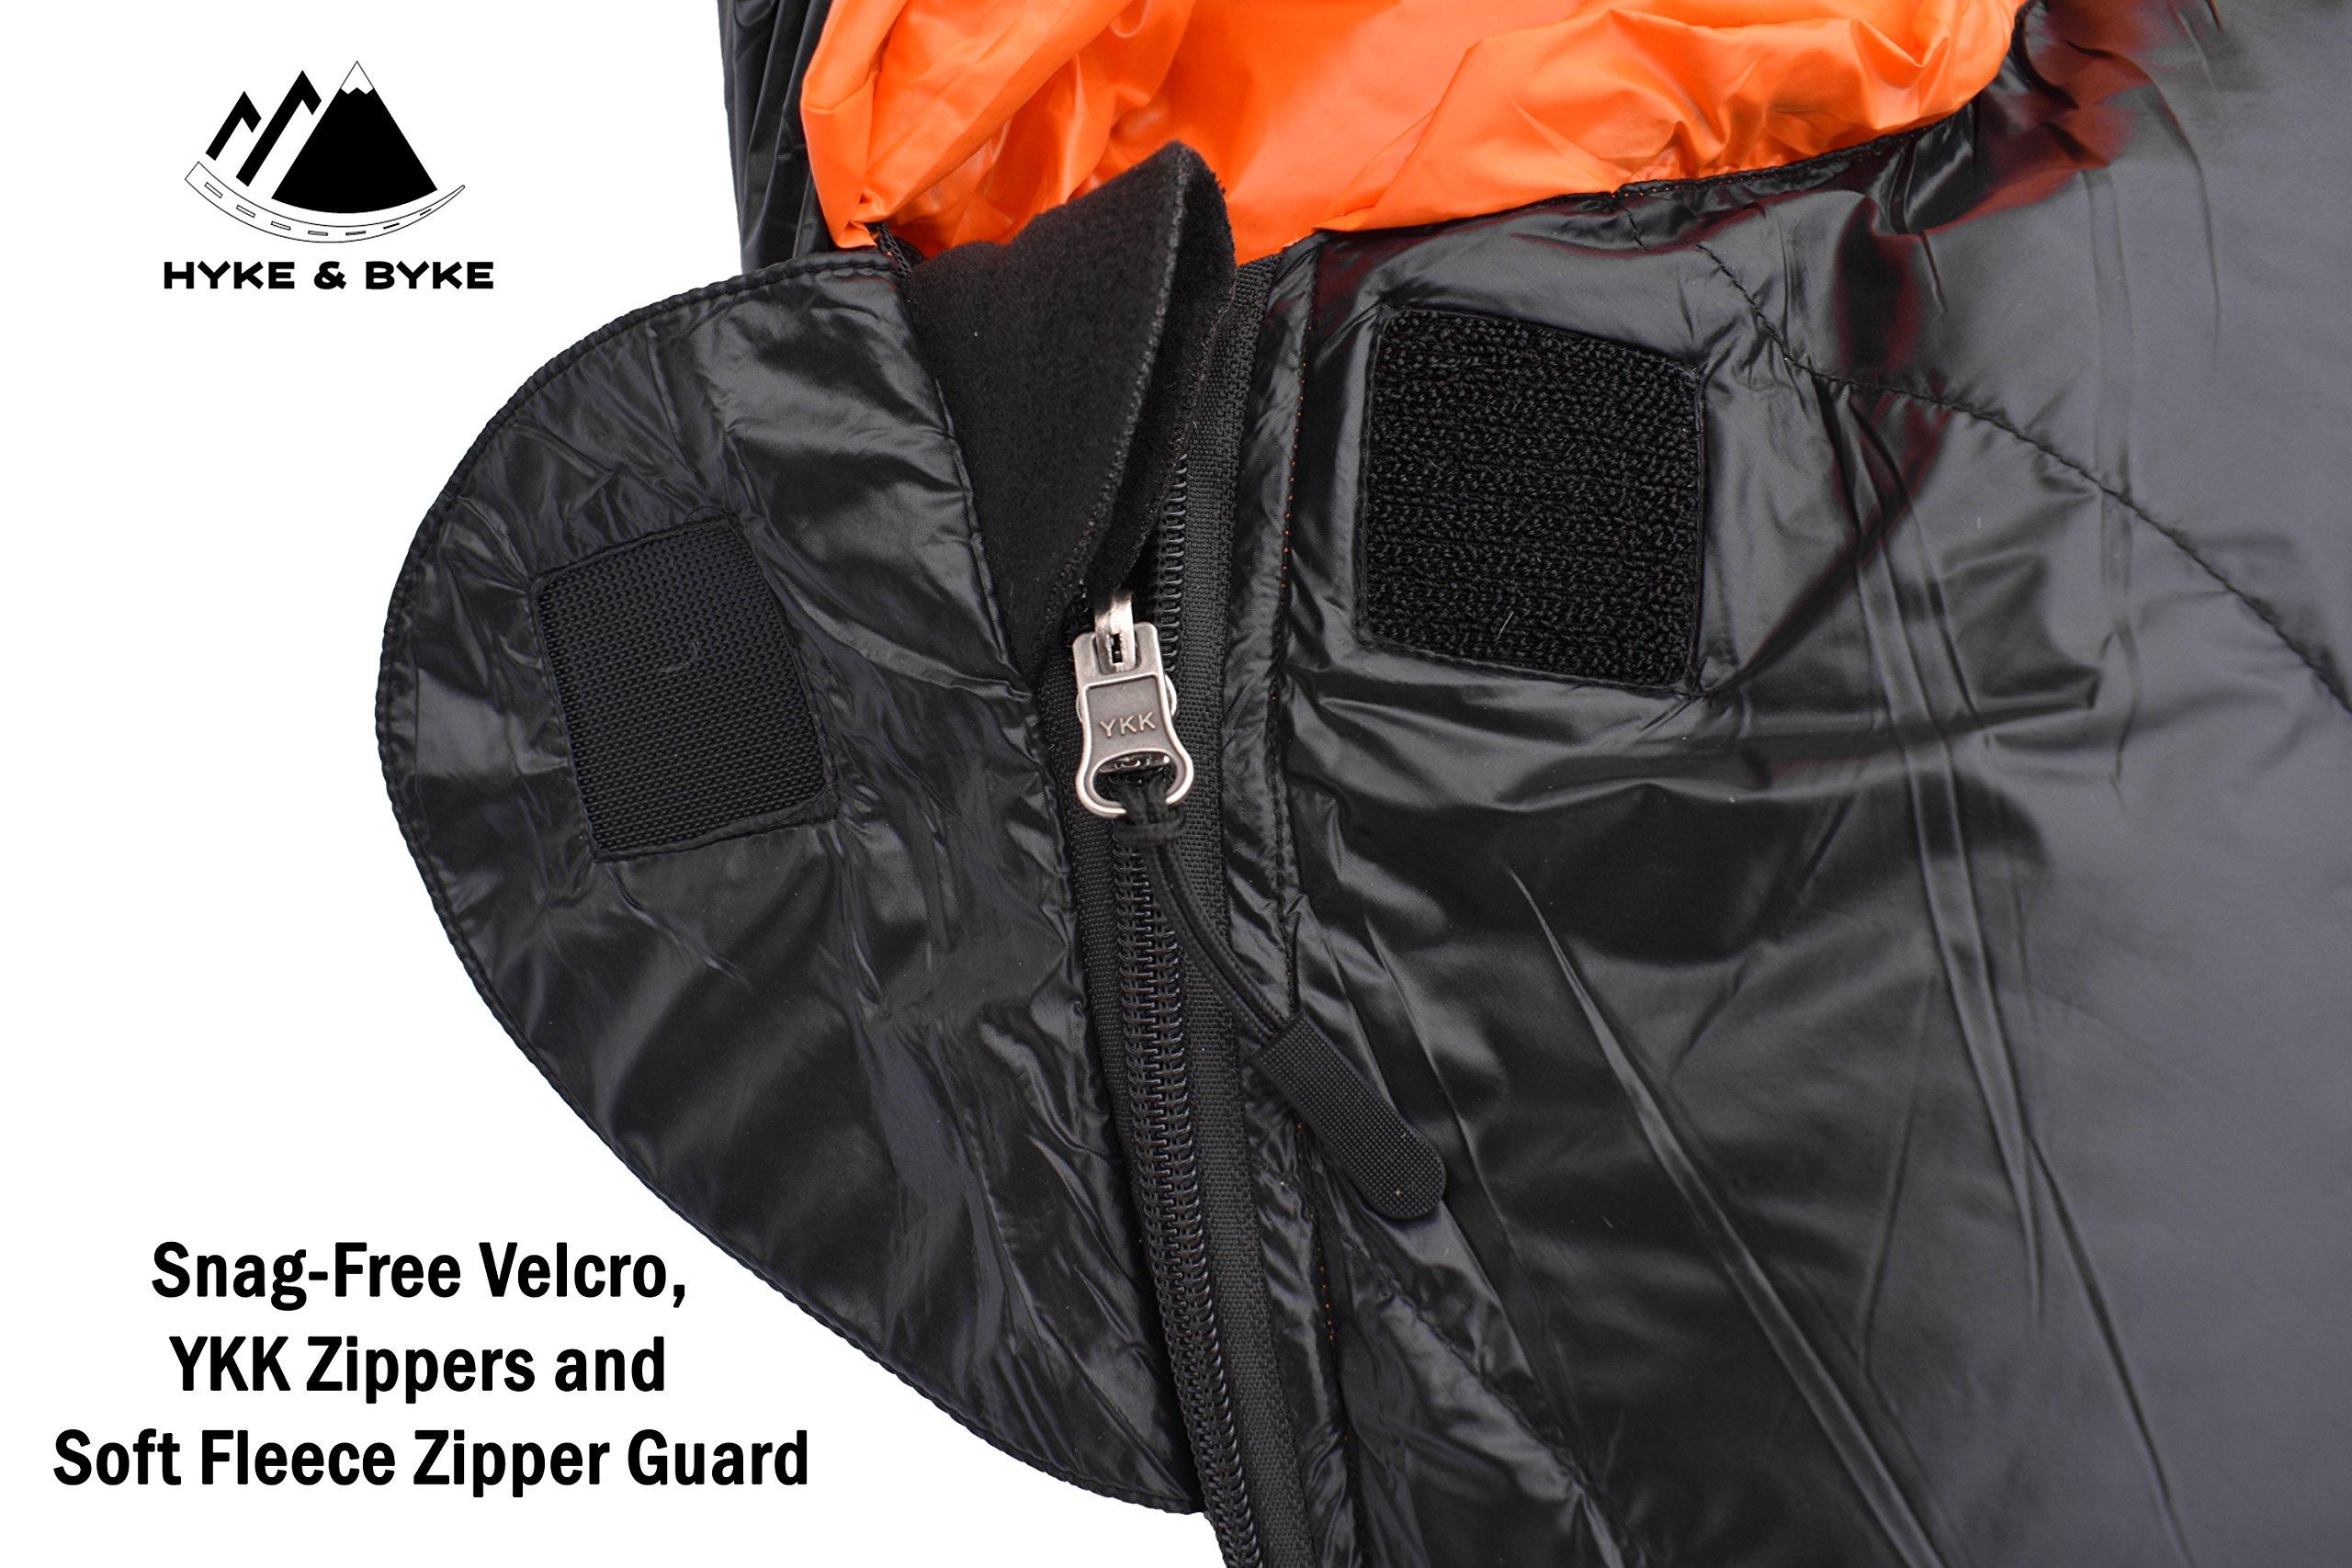 Hyke & Byke Eolus 15 & 30 Degree F 800 Fill Power Hydrophobic Goose Down Sleeping Bag with ClusterLoft Base - Ultra Lightweight 3 Season Men's and Women's Mummy Bag Designed for Backpacking 7